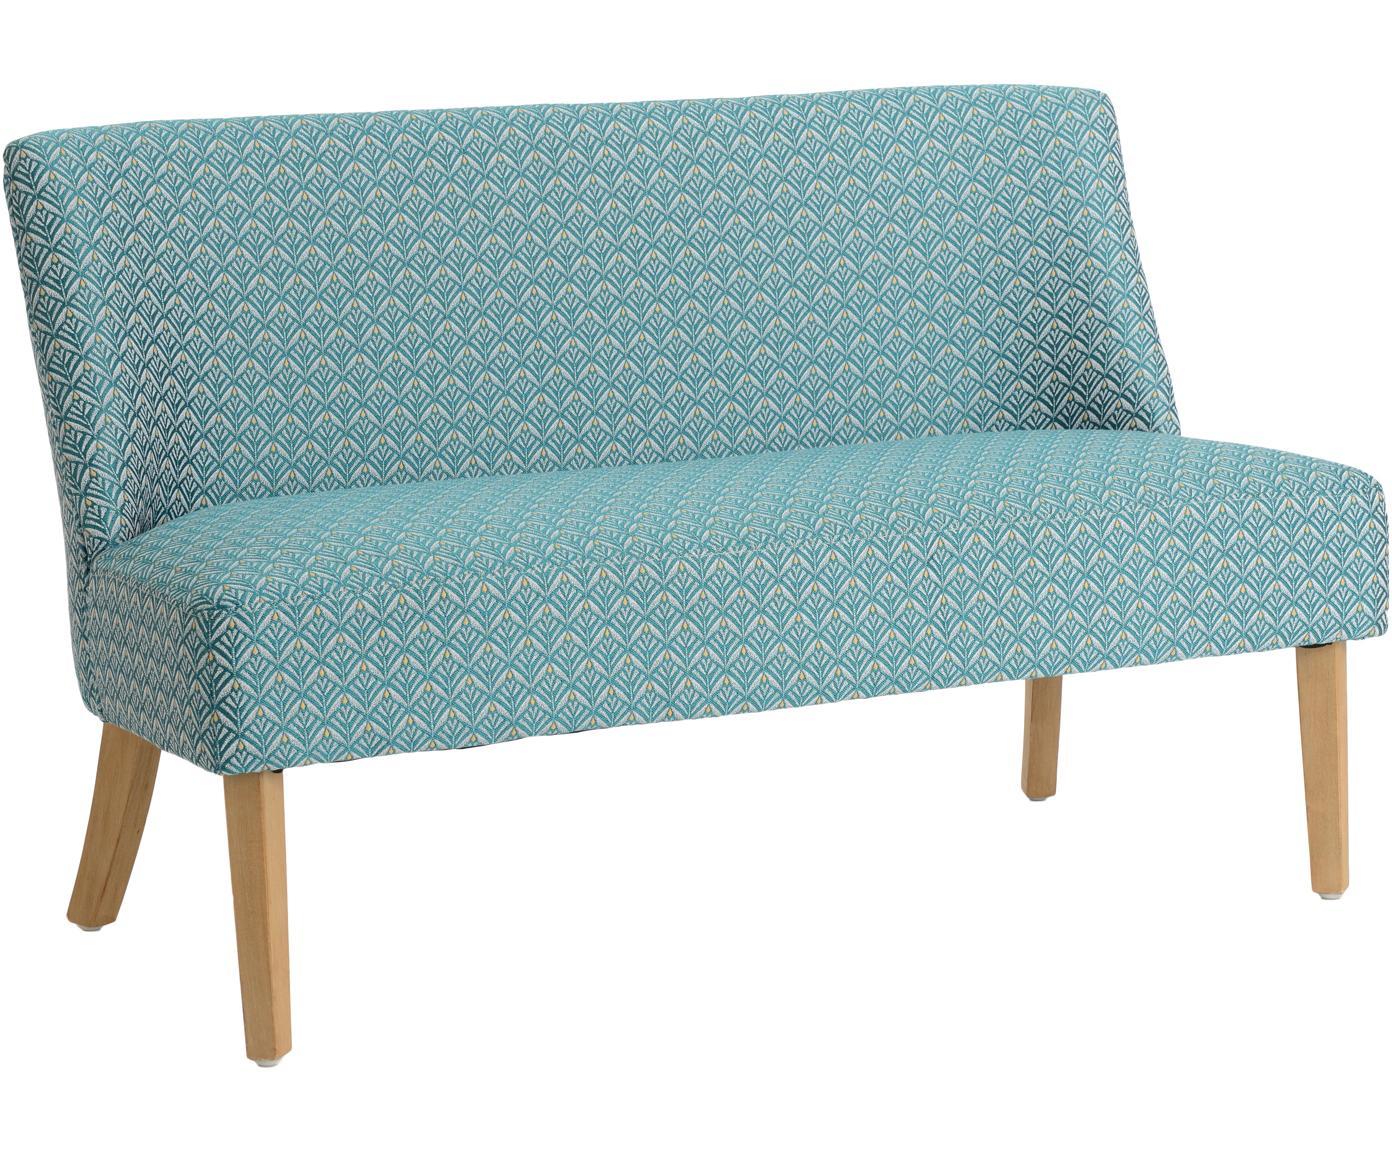 Sofá Daba, Tapizado: poliéster, algodón, Azul, beige, An 110 x Al 70 cm